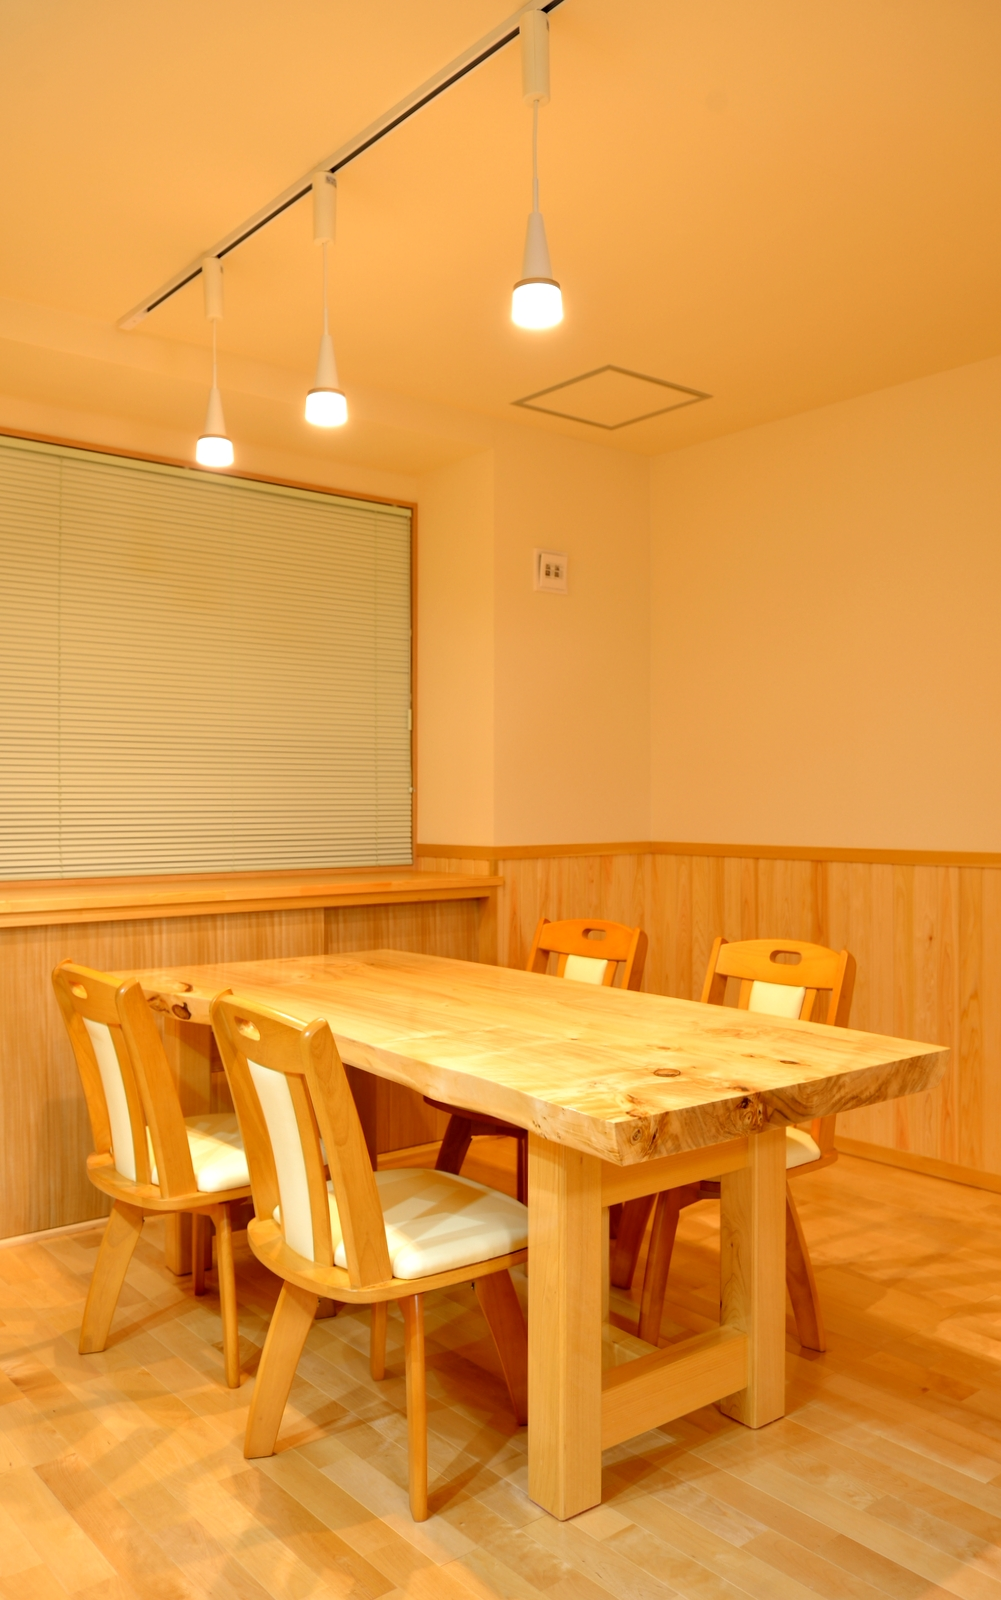 1F食卓テーブルは当社オリジナルで、天板は無垢の一枚板